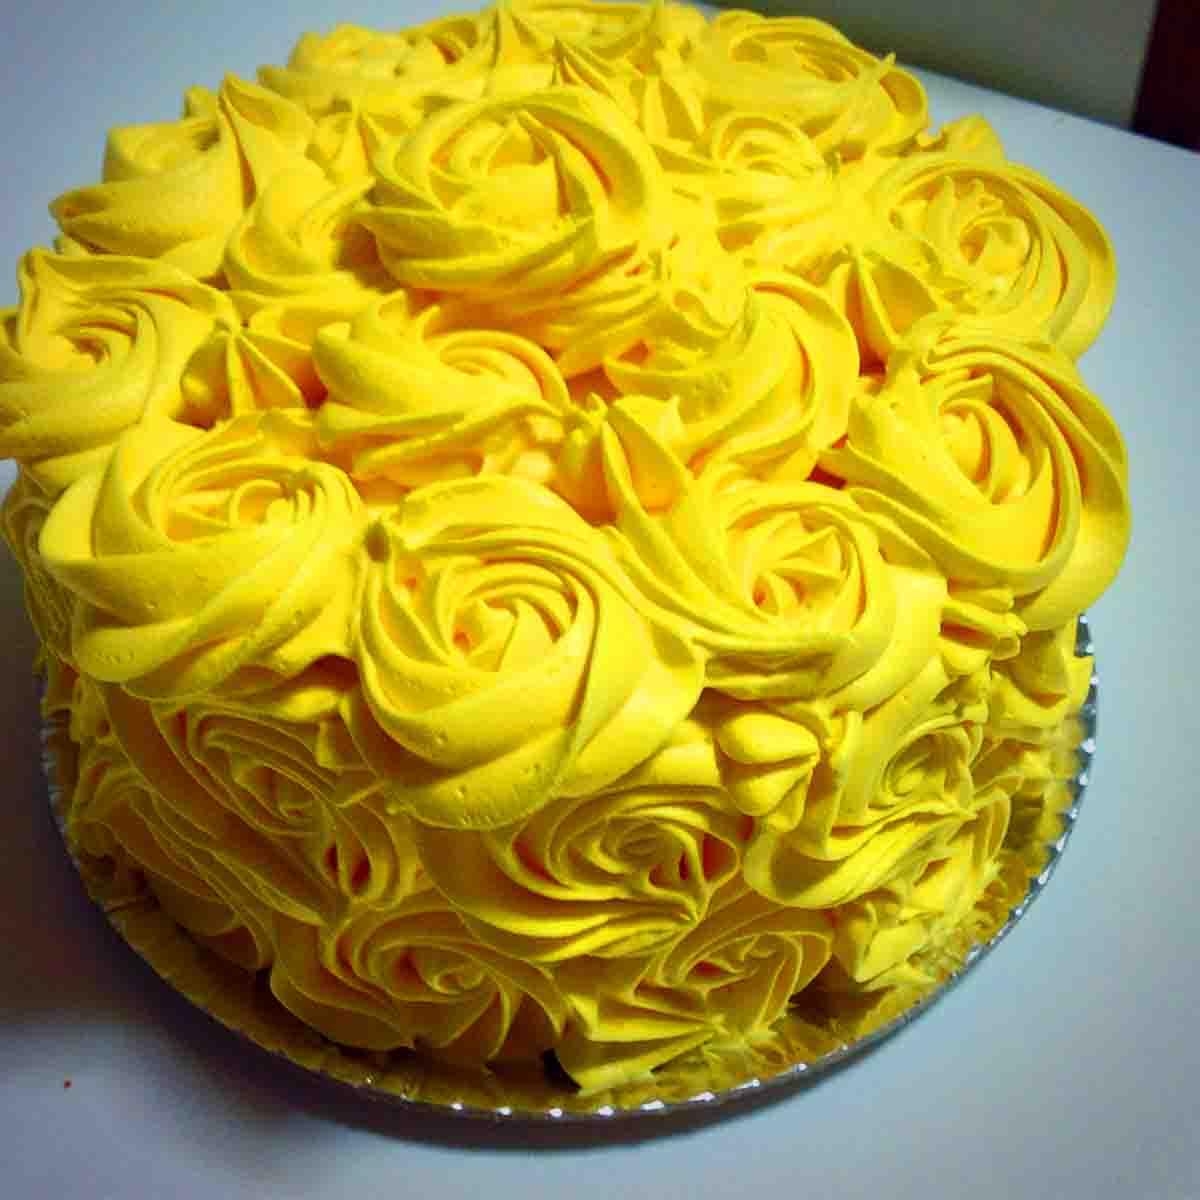 Essência alimentício líquido Amarelo Gema 960ml Arcolor